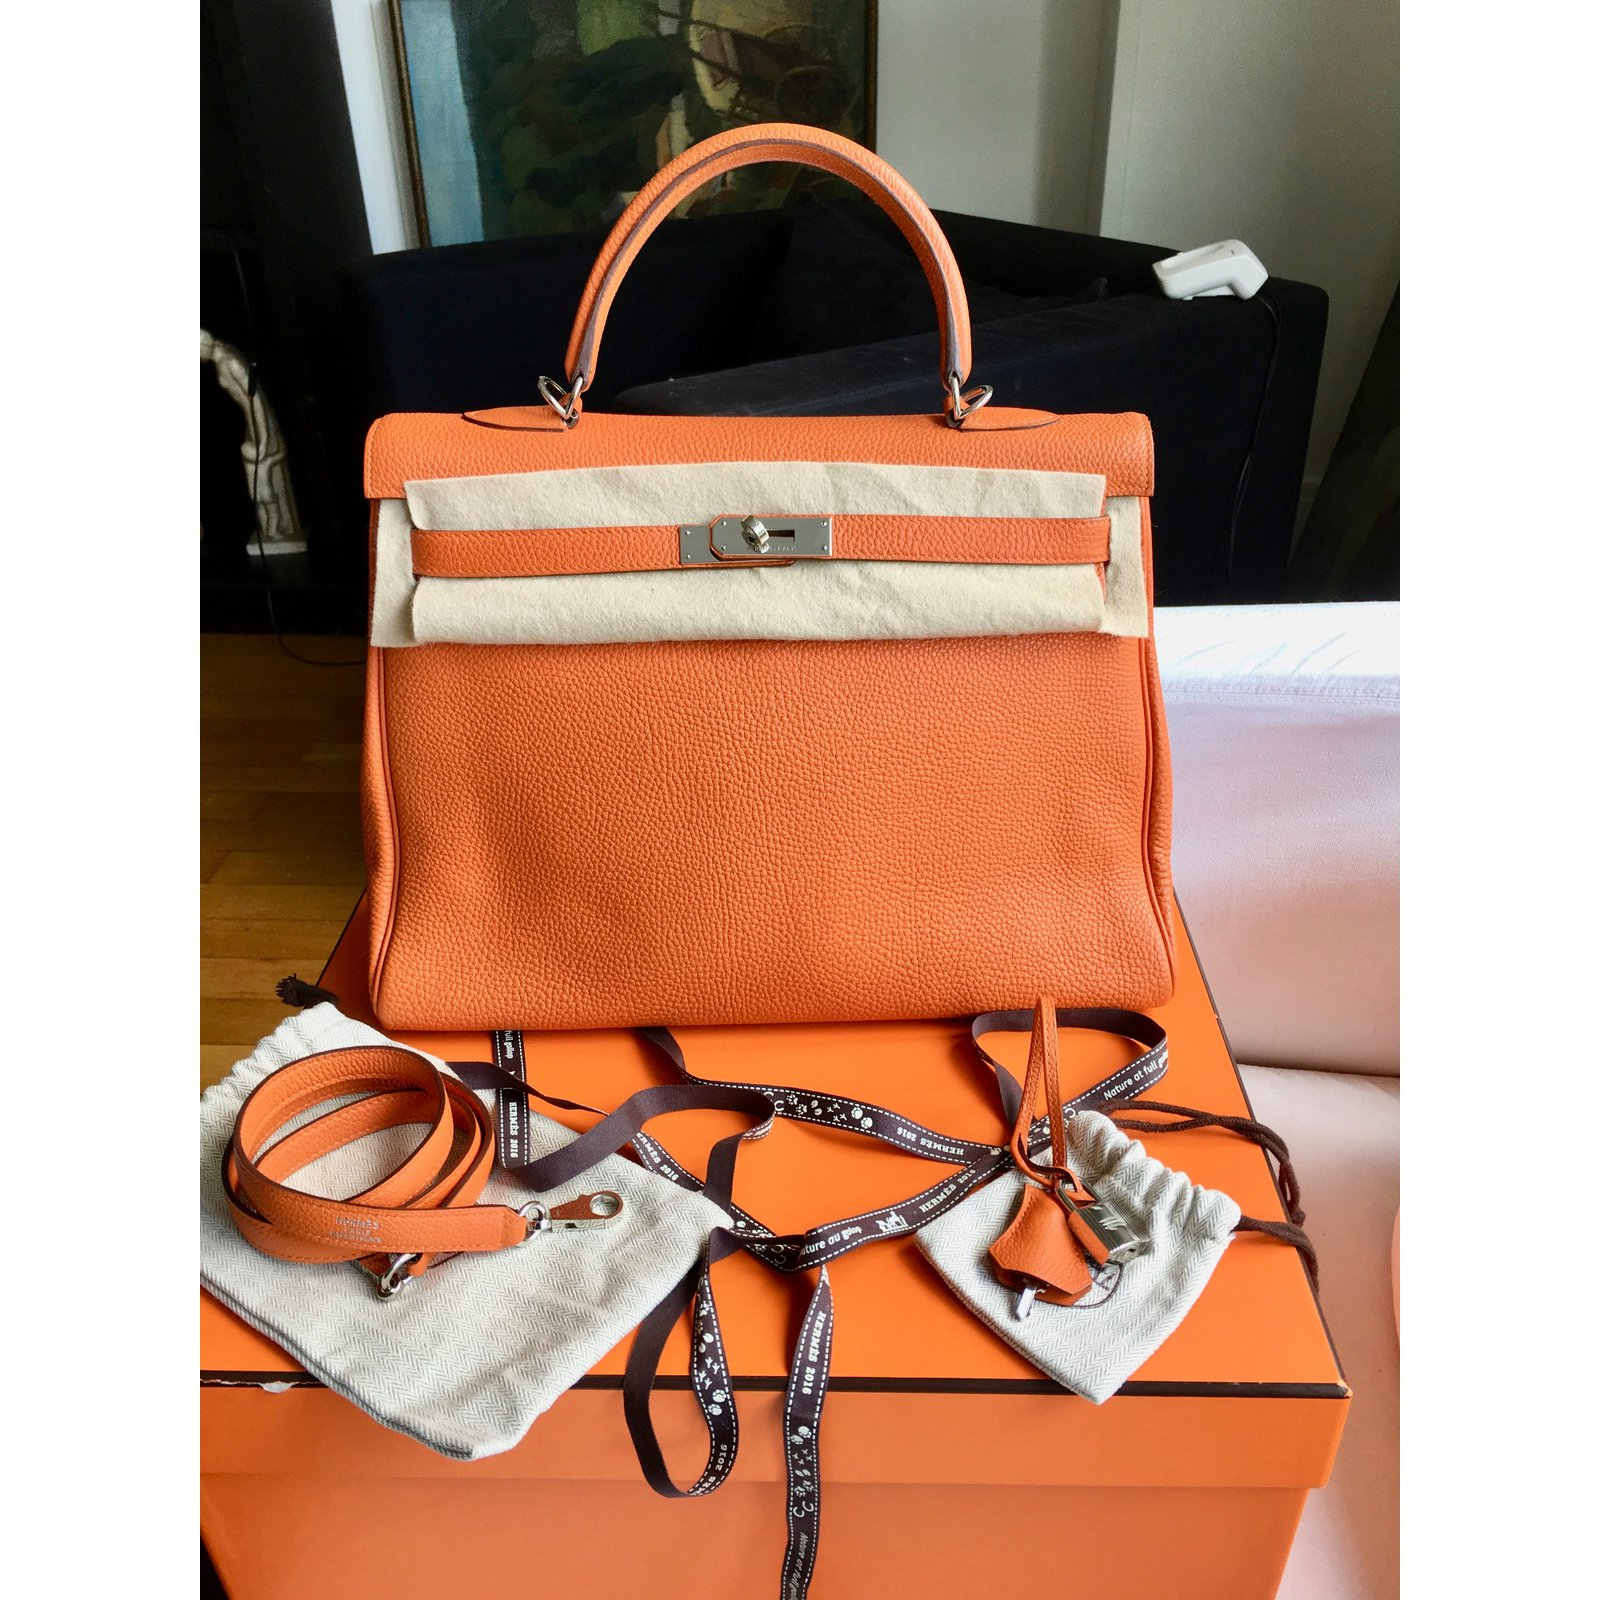 399168ee380d Hermès Kelly 35 cm Handbags Leather Orange ref.41525 - Joli Closet